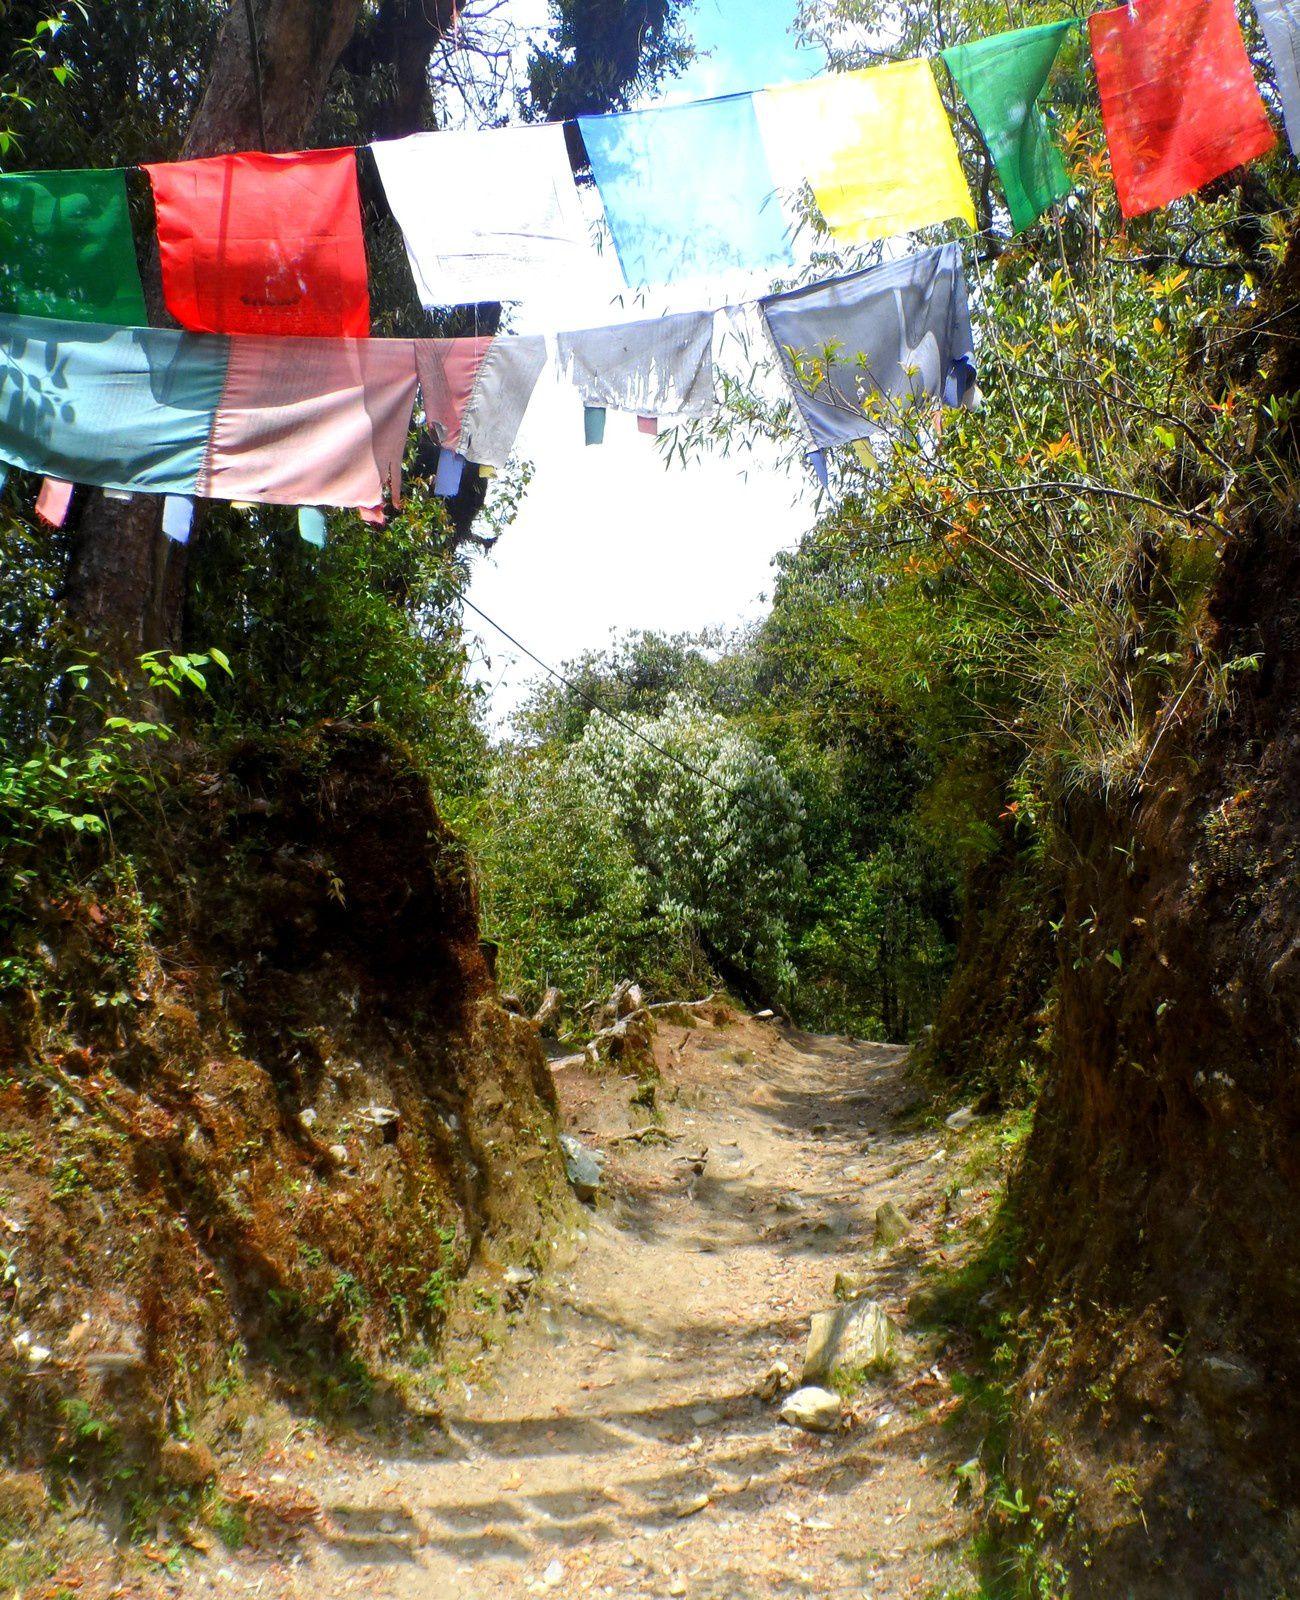 Les premières pentes de l'Annapurna